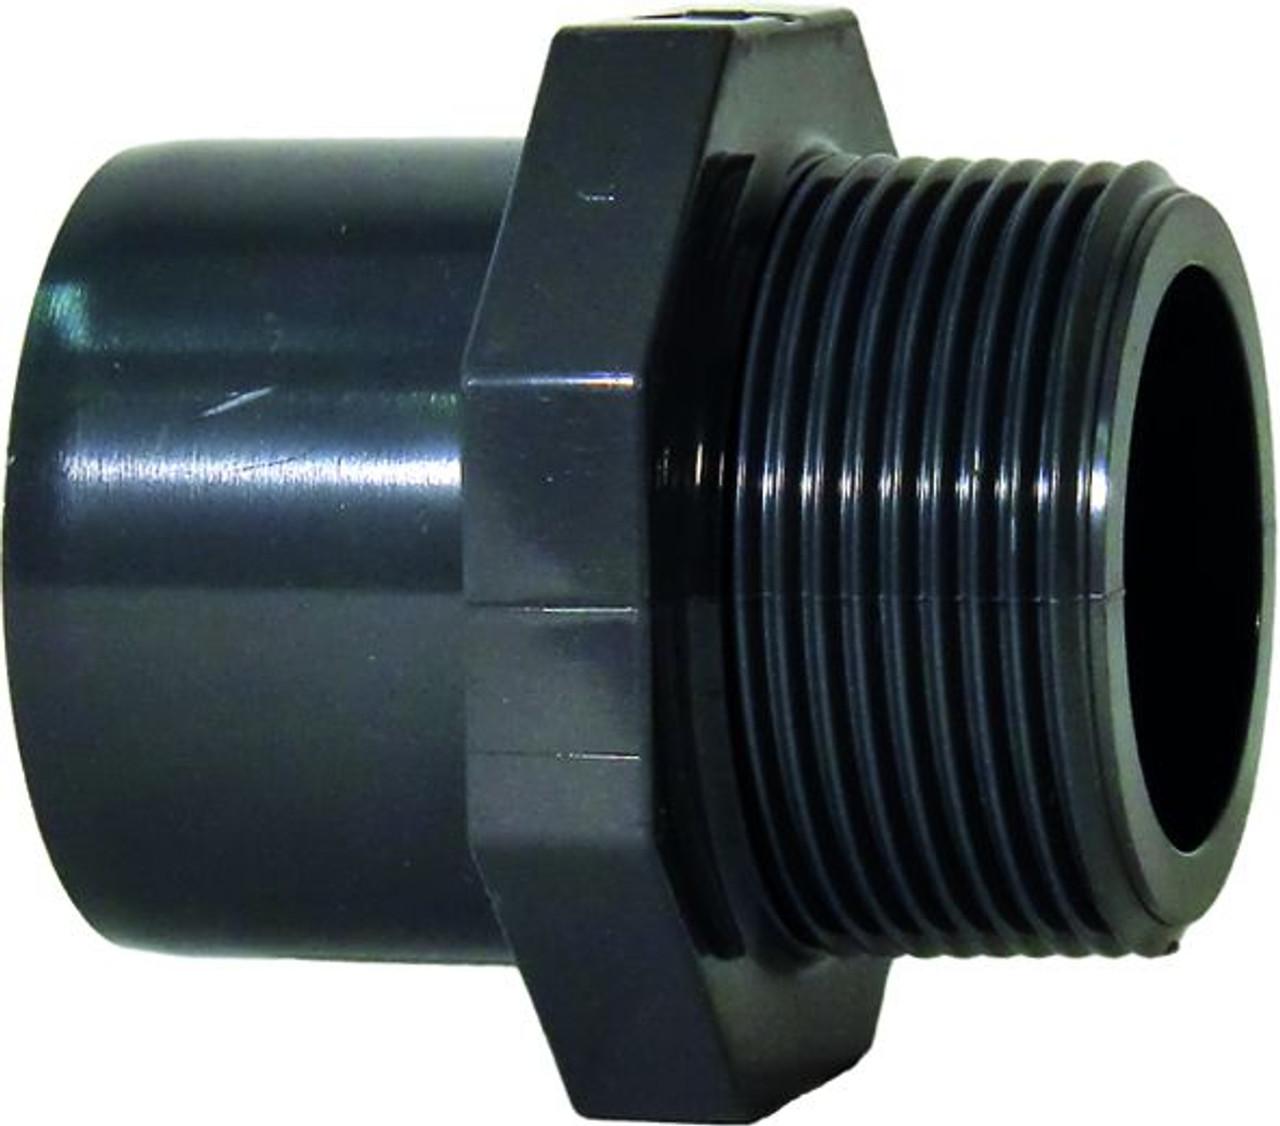 "+GF+ | Male Thread Adapter PVC-U 25mm x R1"" (721910558)"